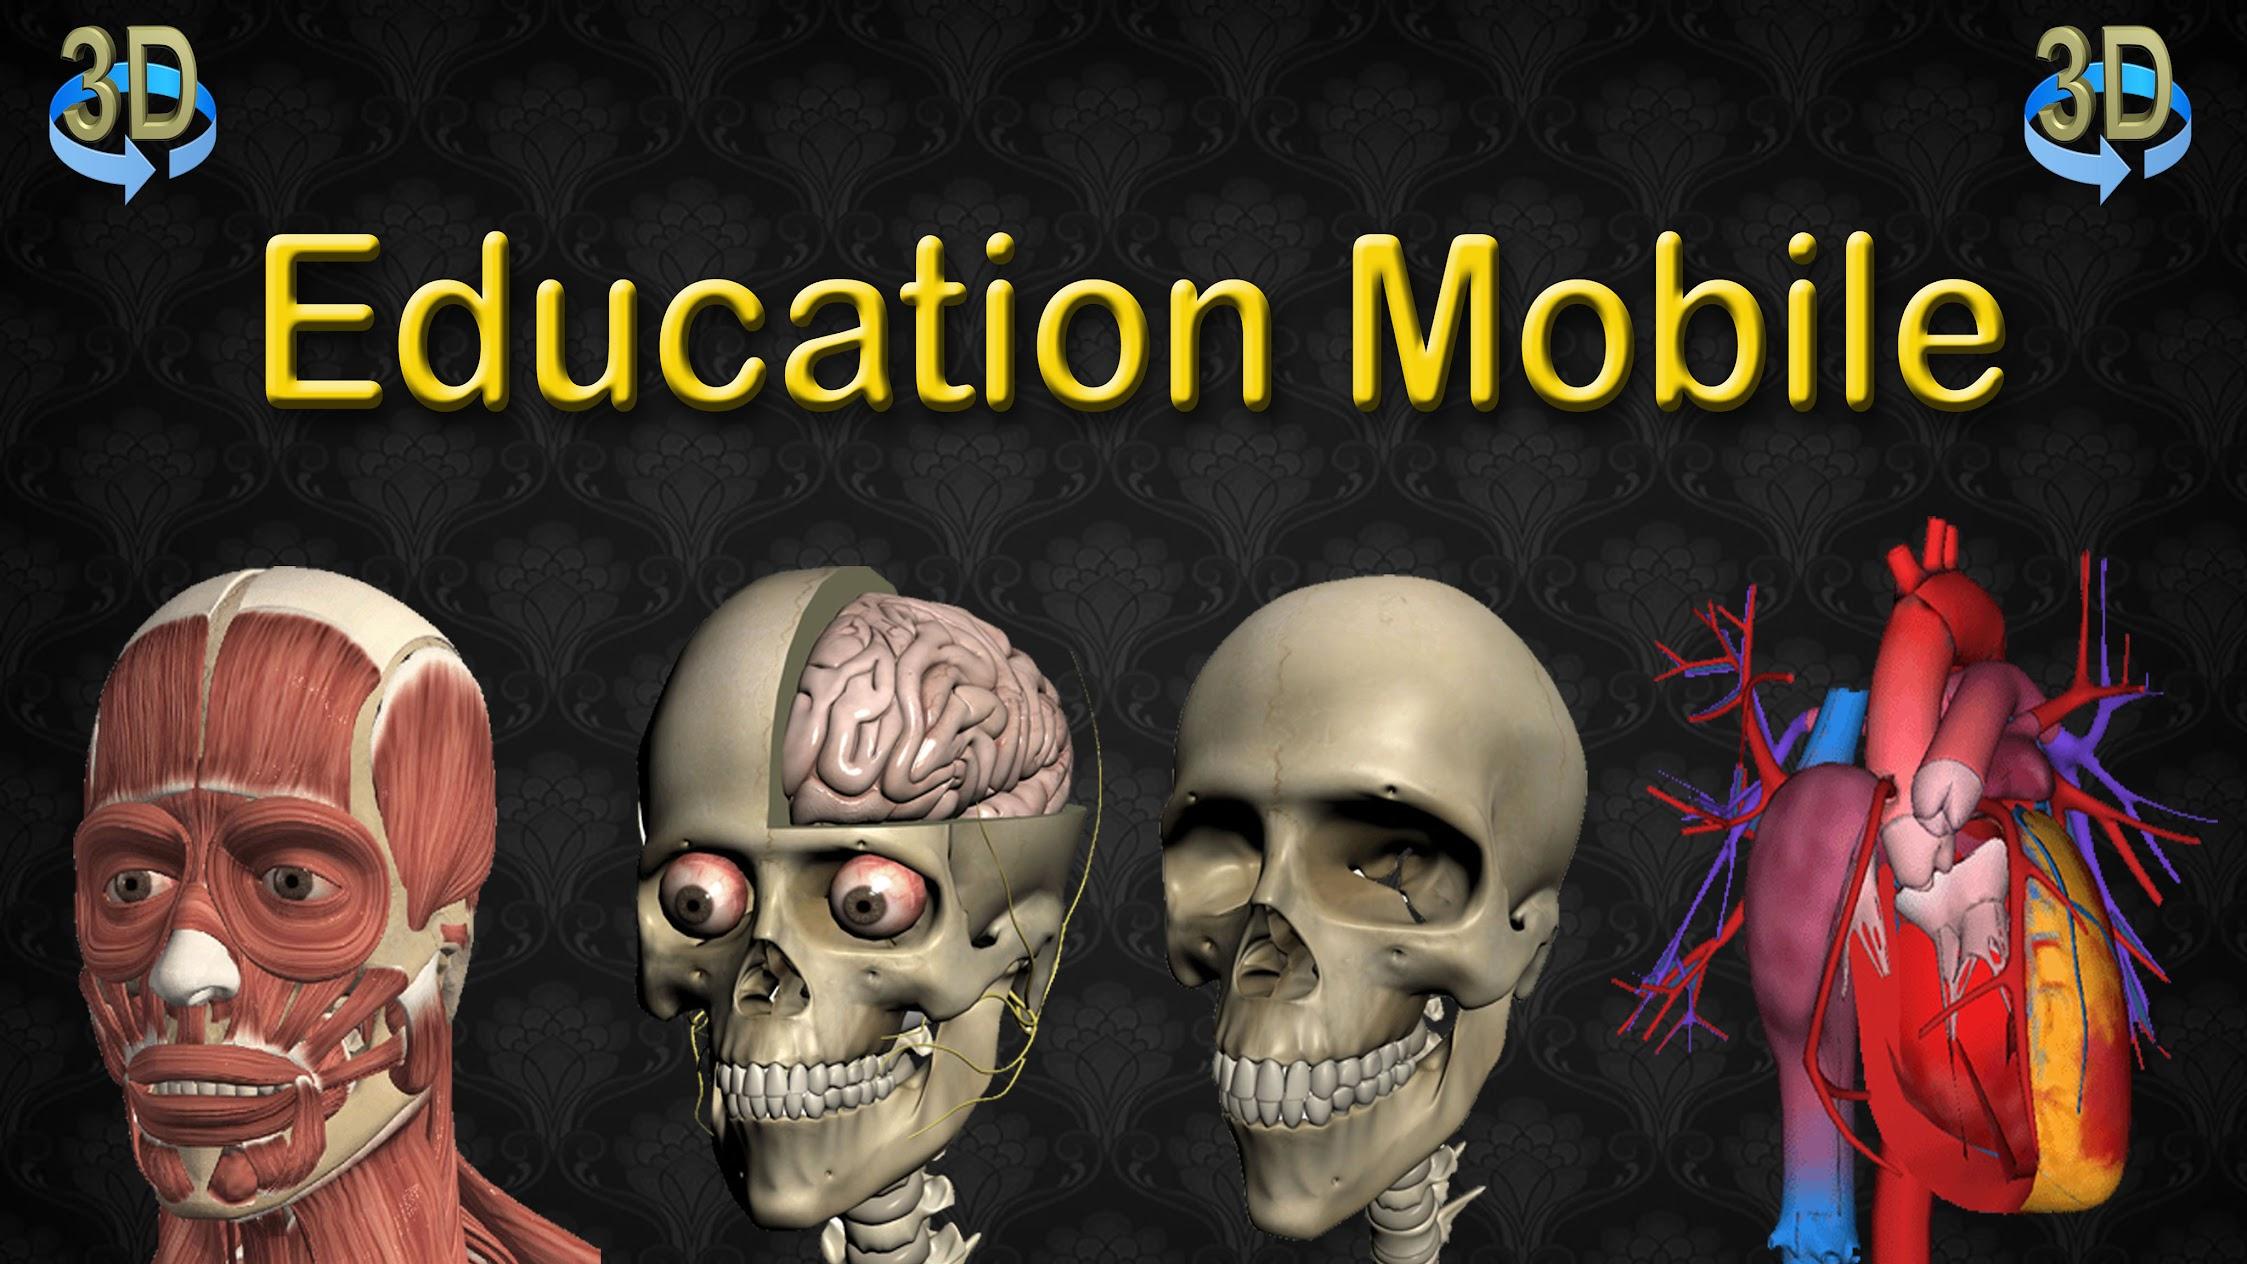 Education Mobile